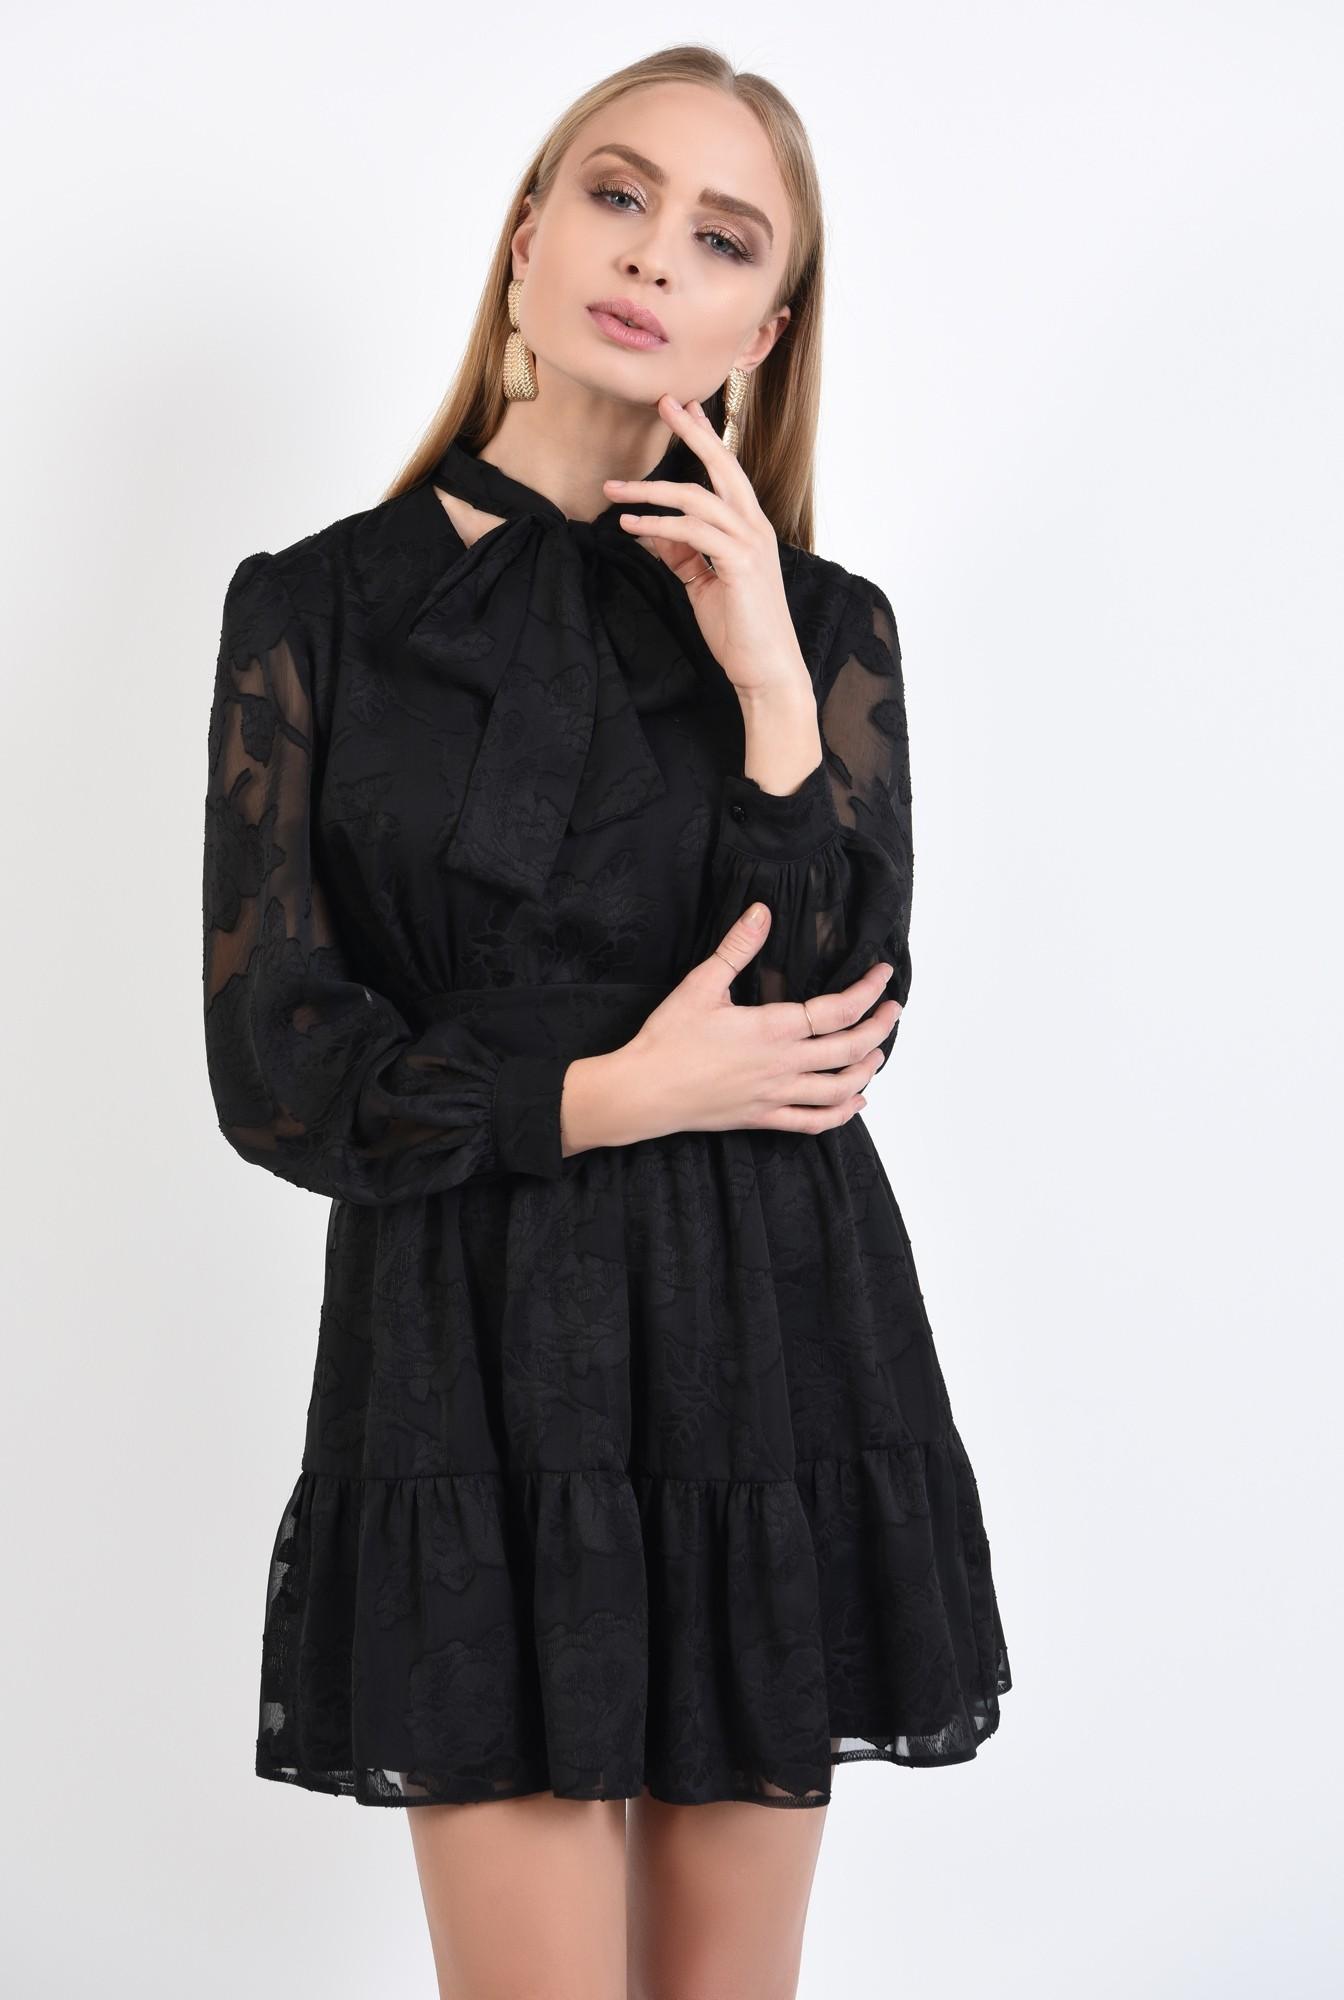 0 - rochie neagra, little black dress, croi evazat cu volan